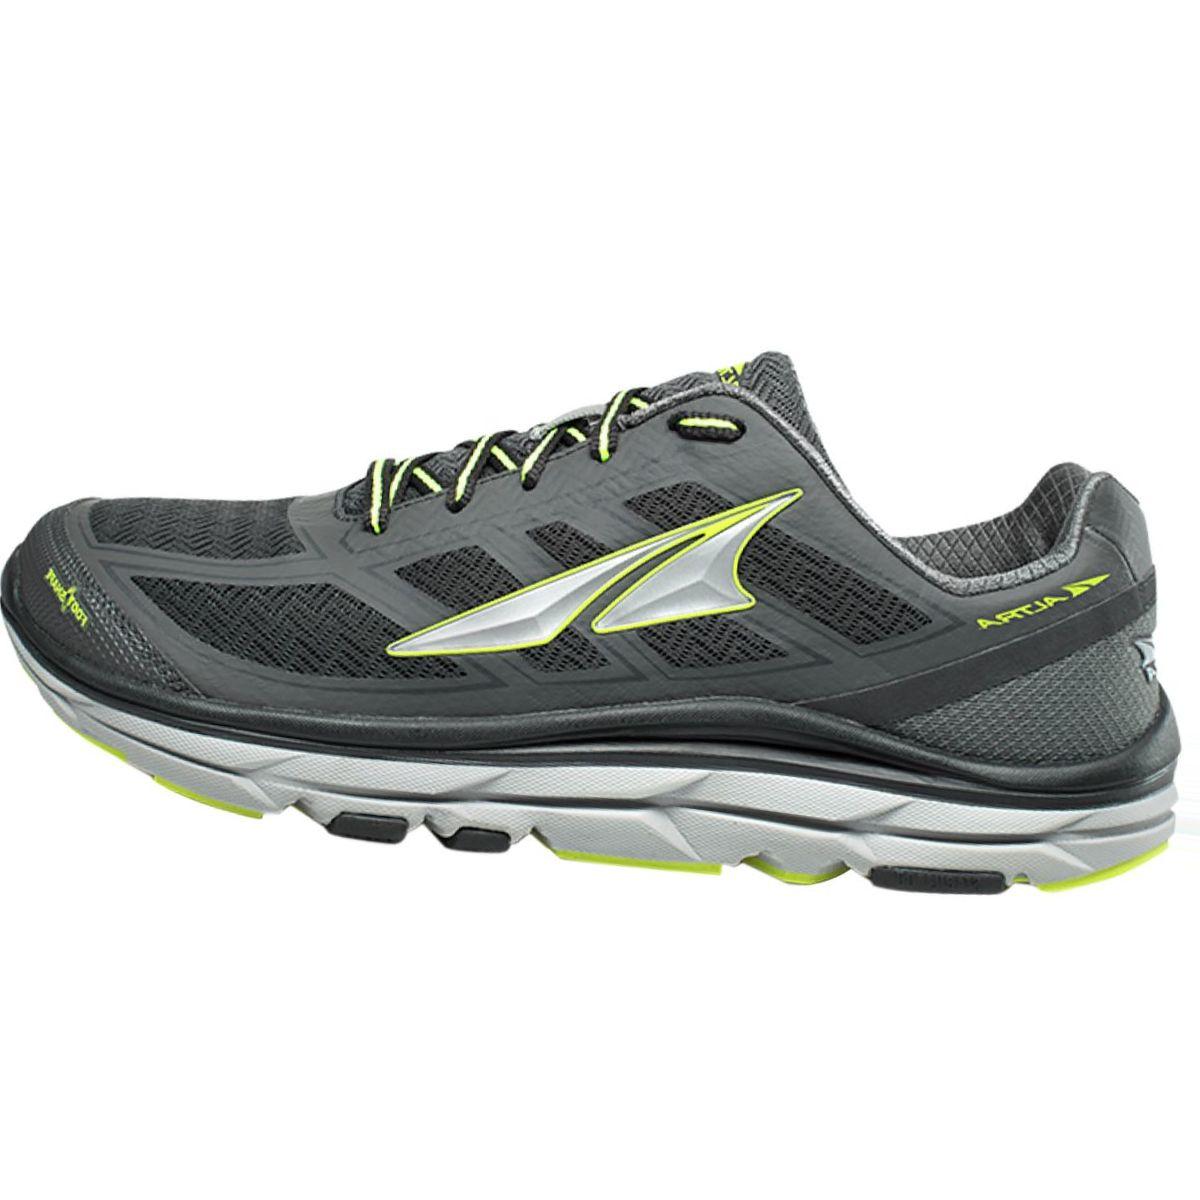 Altra Provision 3.5 Running Shoe - Men's